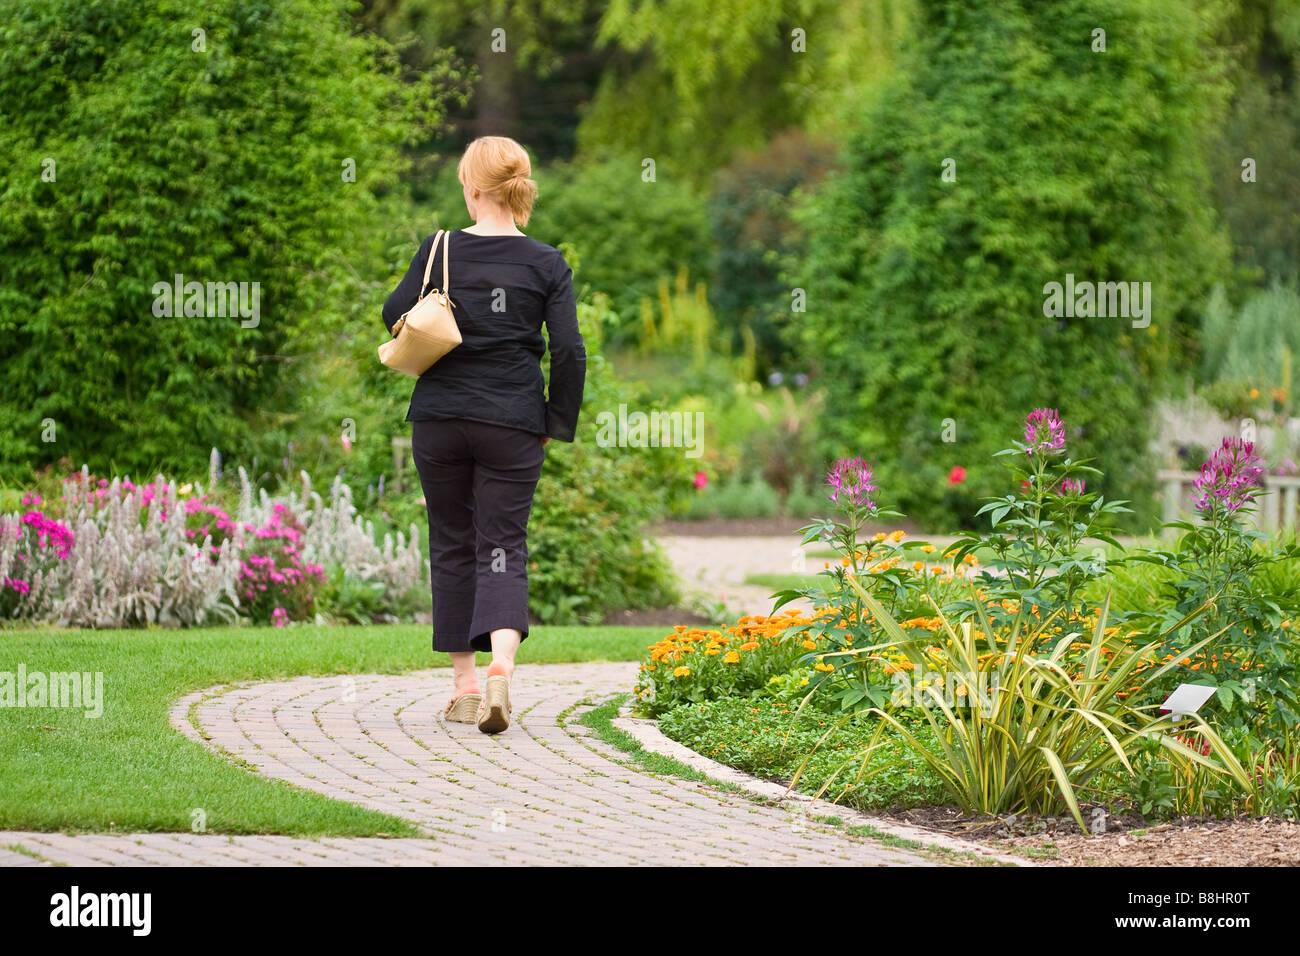 Woman walking down winding garden path, English Gardens, Assiniboine Park, Winnipeg, Manitoba, Canada. - Stock Image